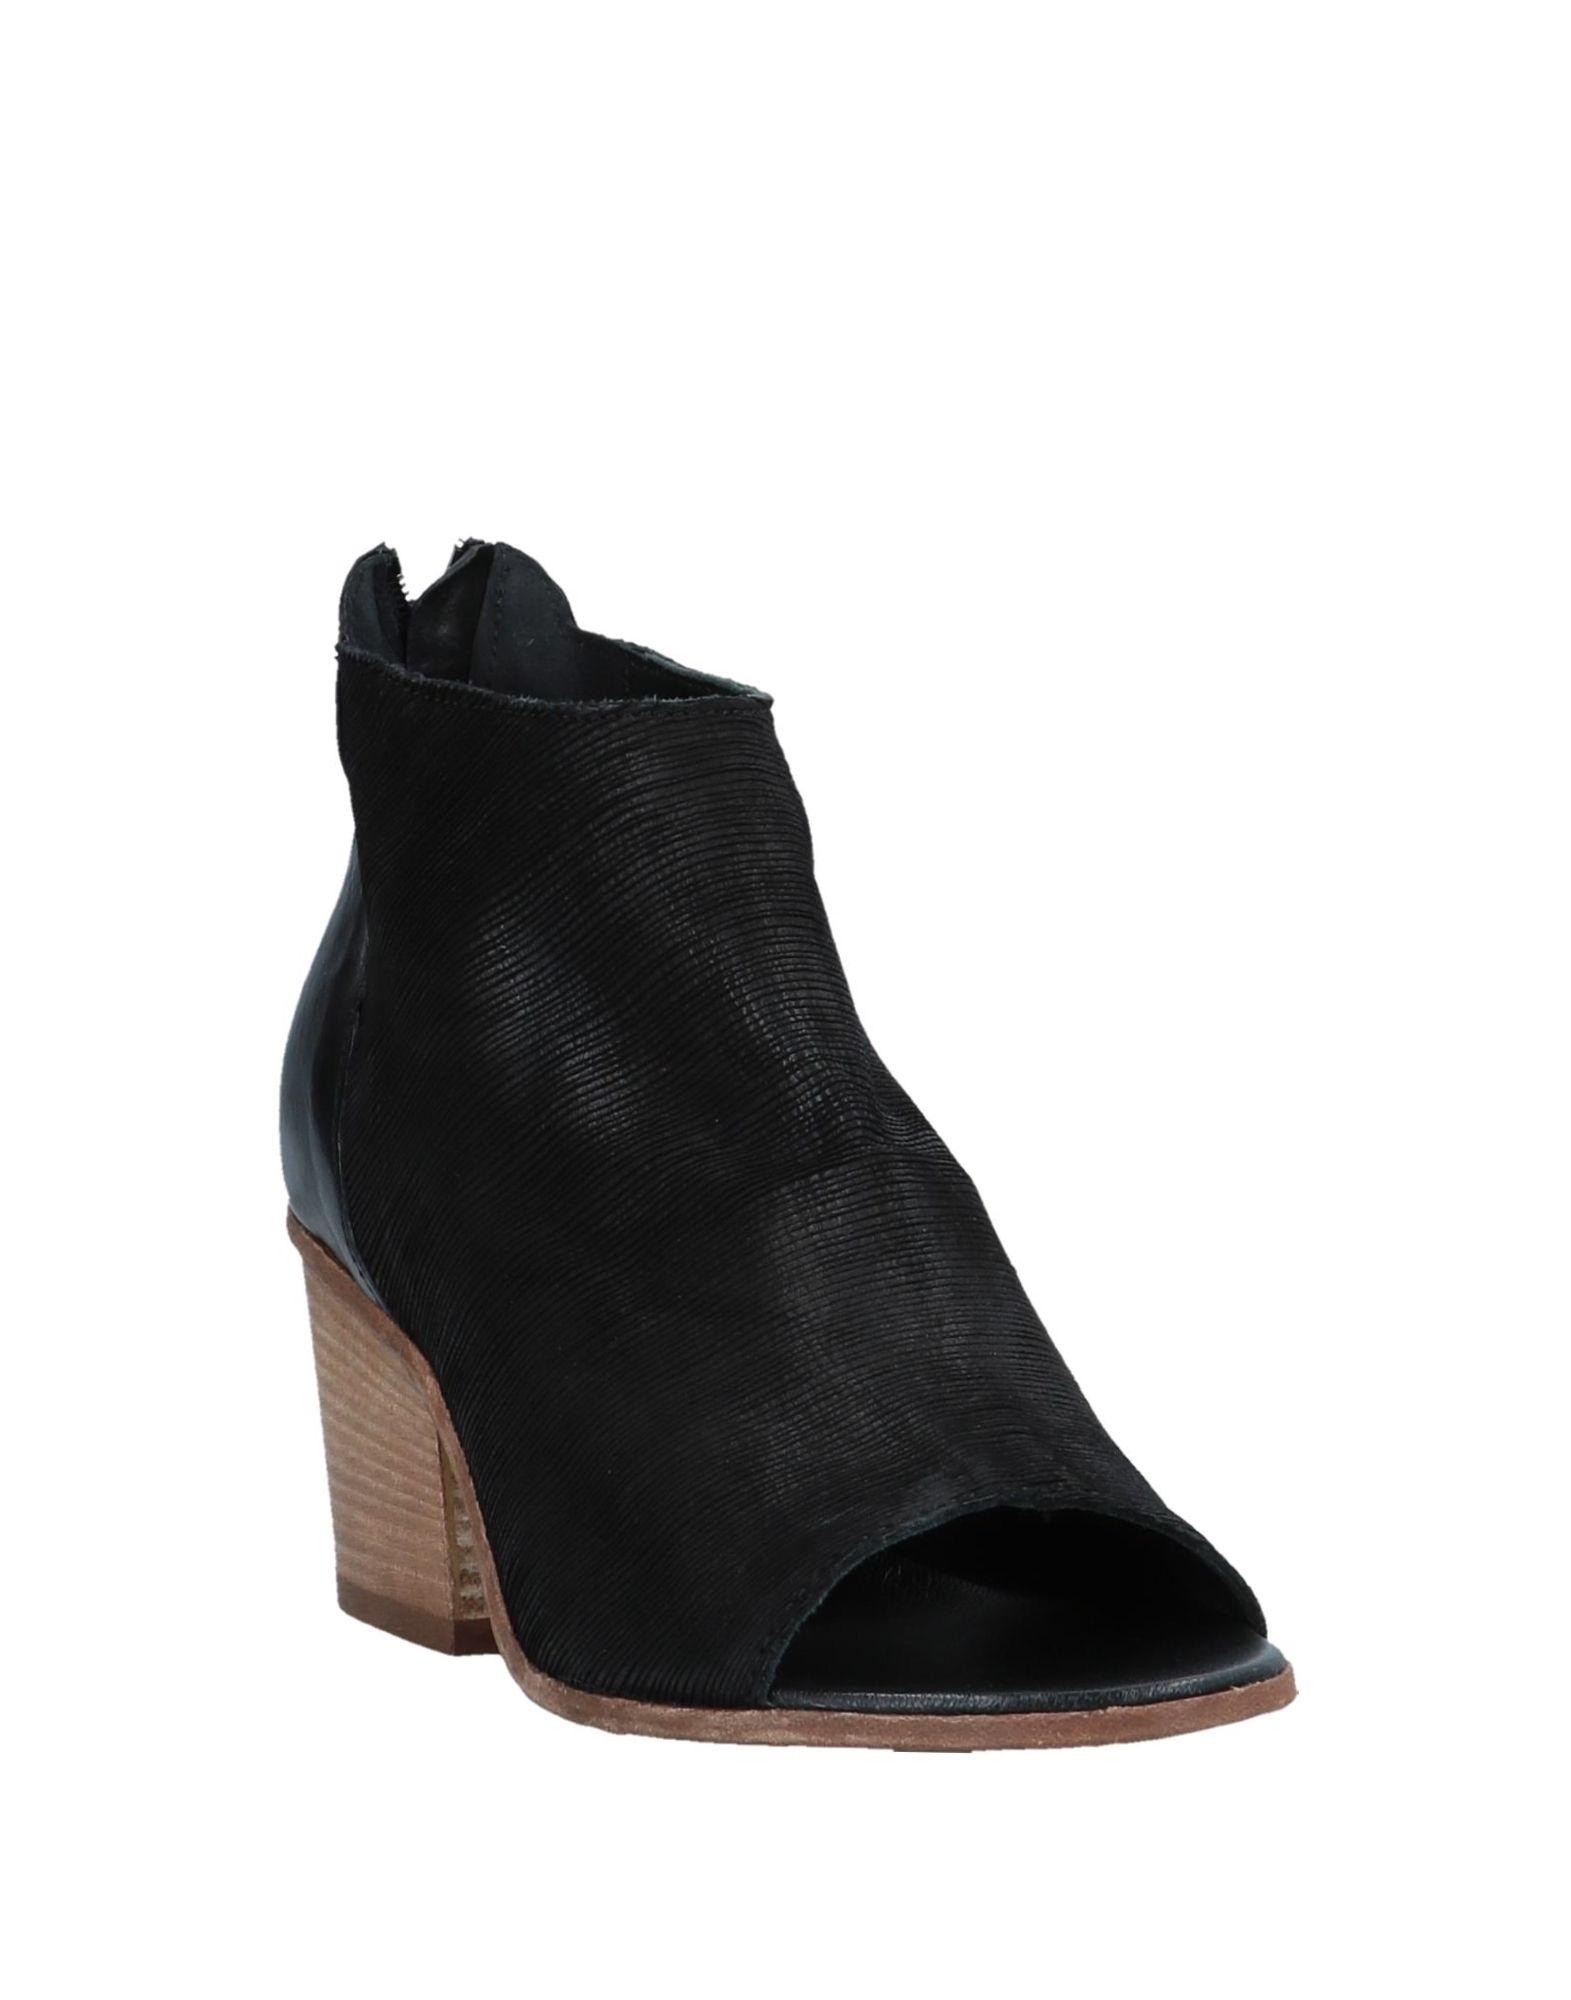 Gut um Damen billige Schuhe zu tragenGarrice Stiefelette Damen um 11559978WU b19c90